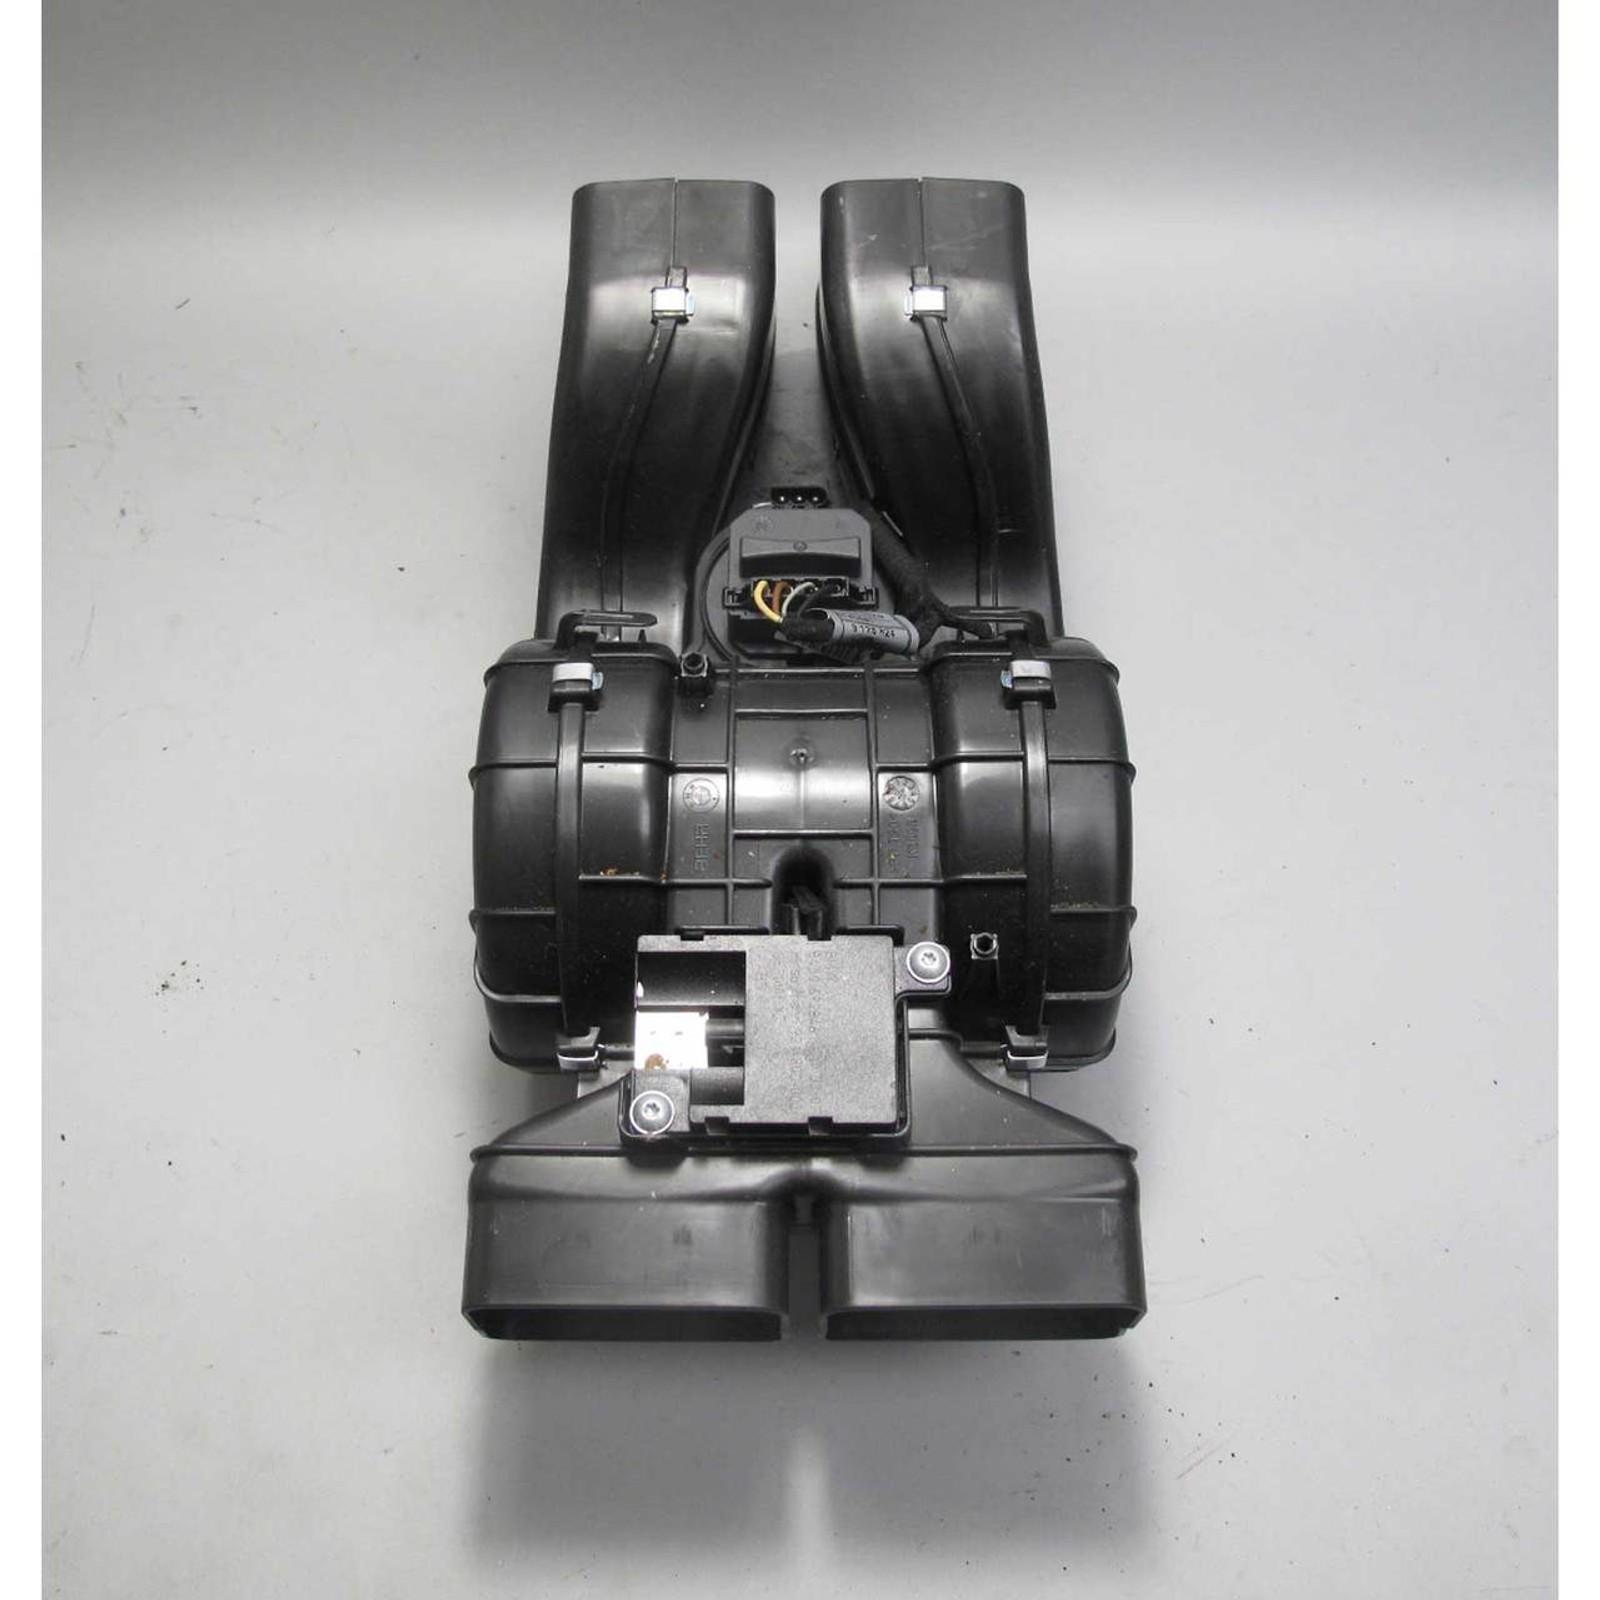 2007 2017 Bmw E70 F15 X5 Hvac Blower Motor For Rear Seats W Housing